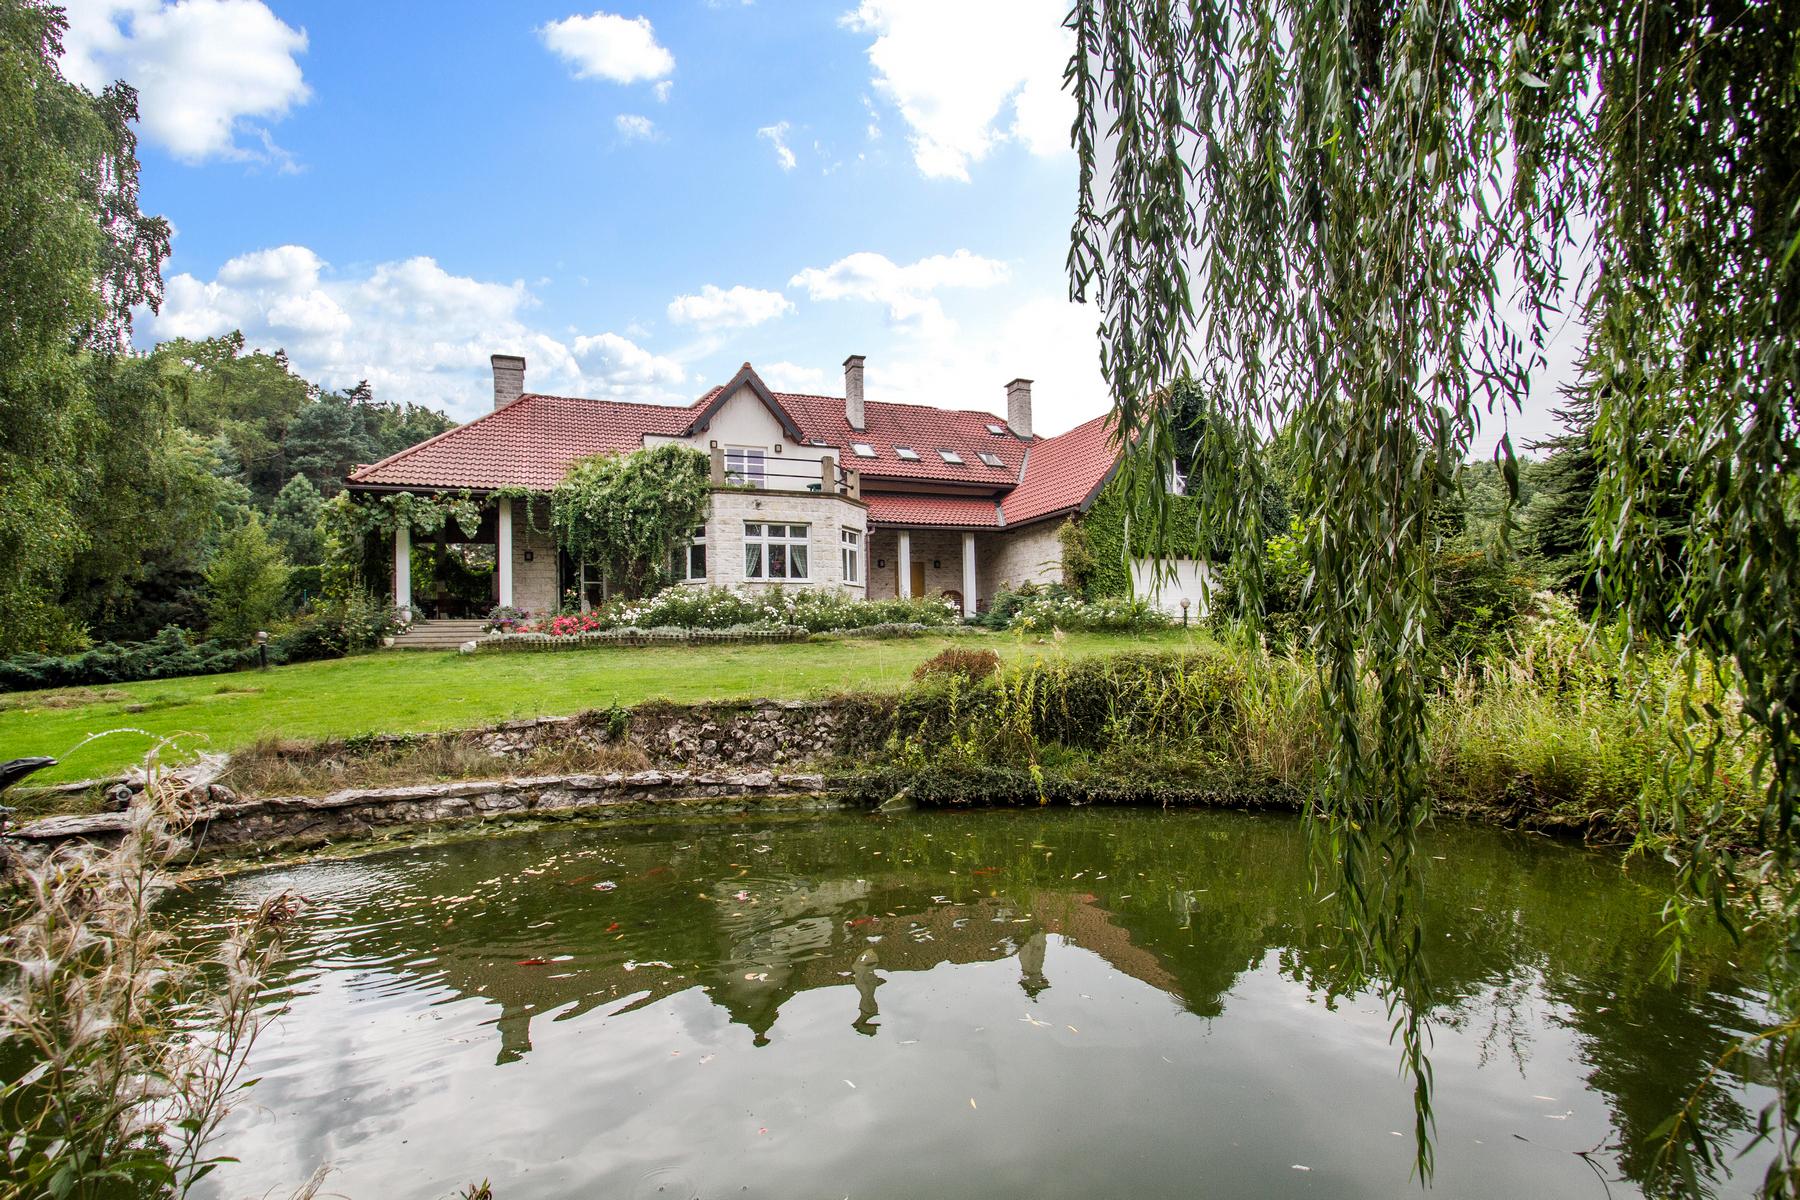 Maison unifamiliale pour l Vente à Kraków Dębniki - Podgórki Tynieckie Cracow, Malopolska, Pologne